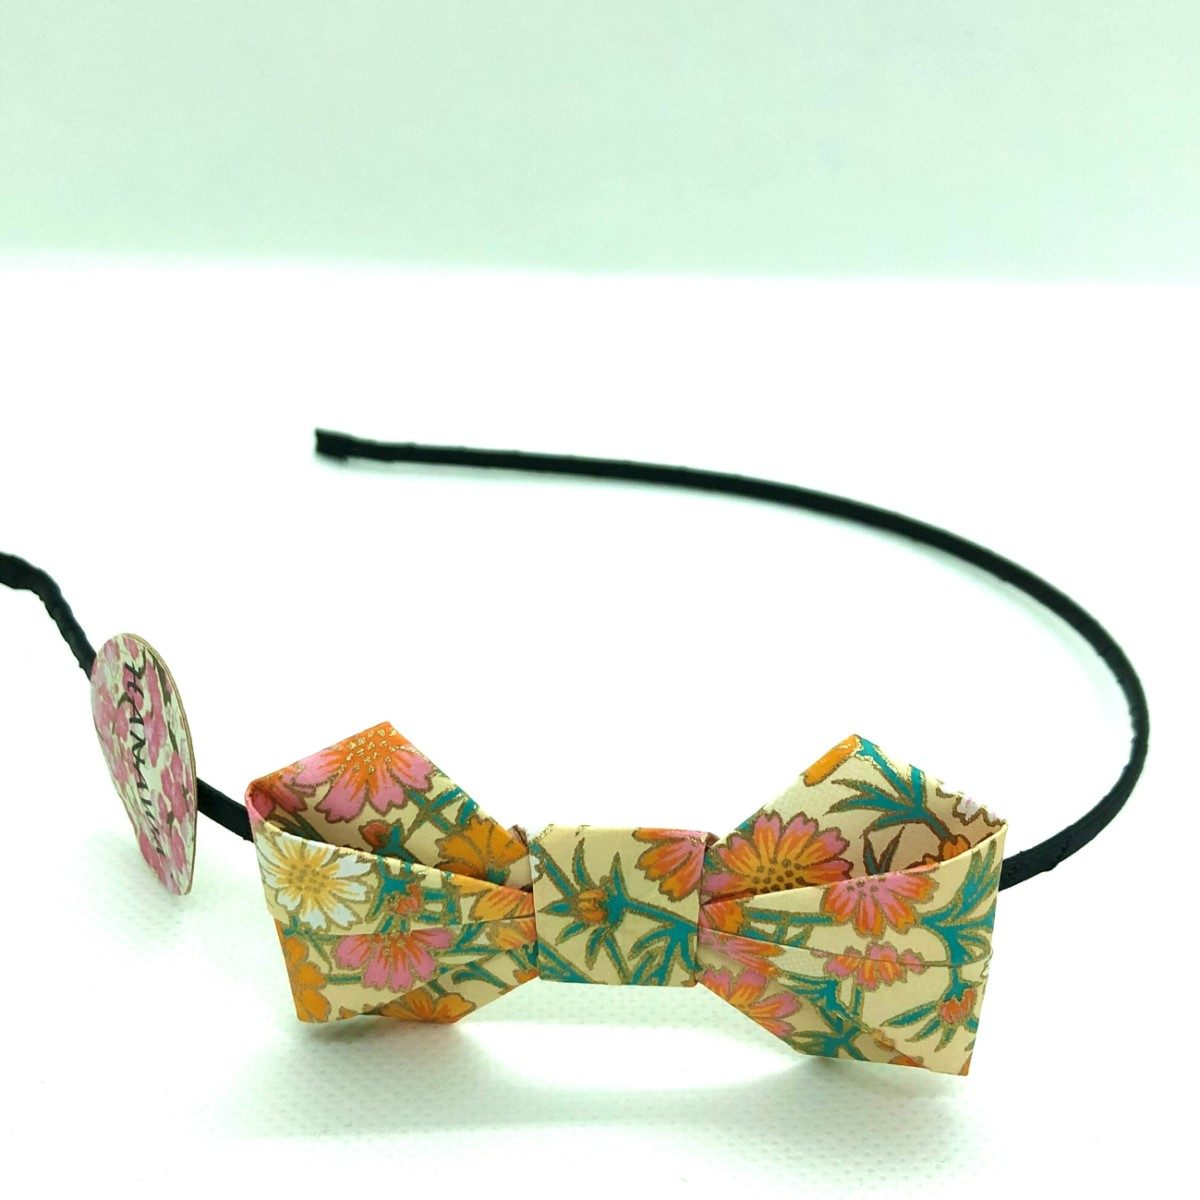 Serre-tête avec nœud en origami jaune